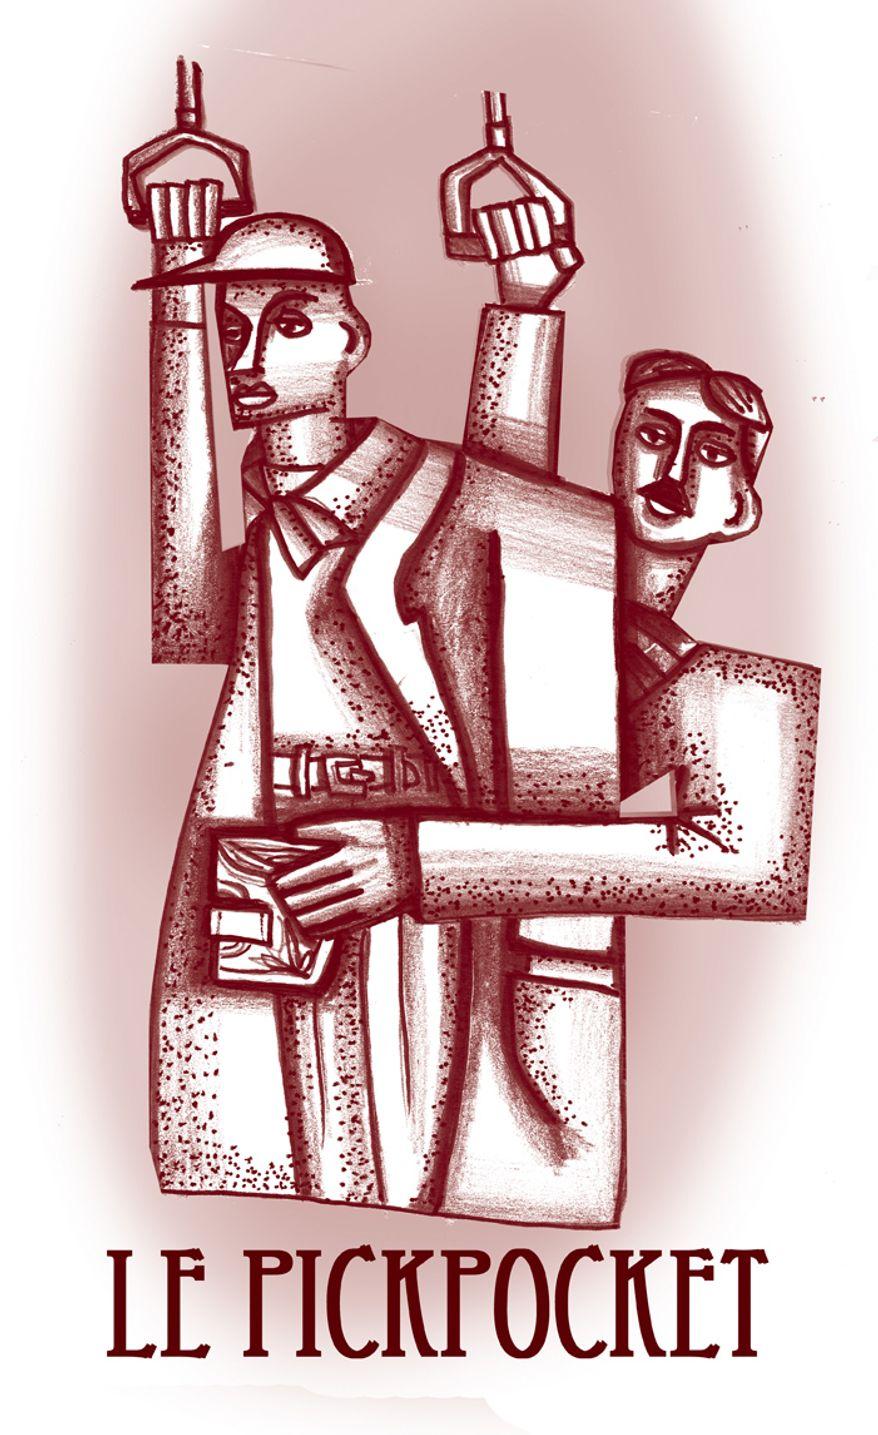 Illustration: Le Pickpocket by John Camejo for The Washington Times